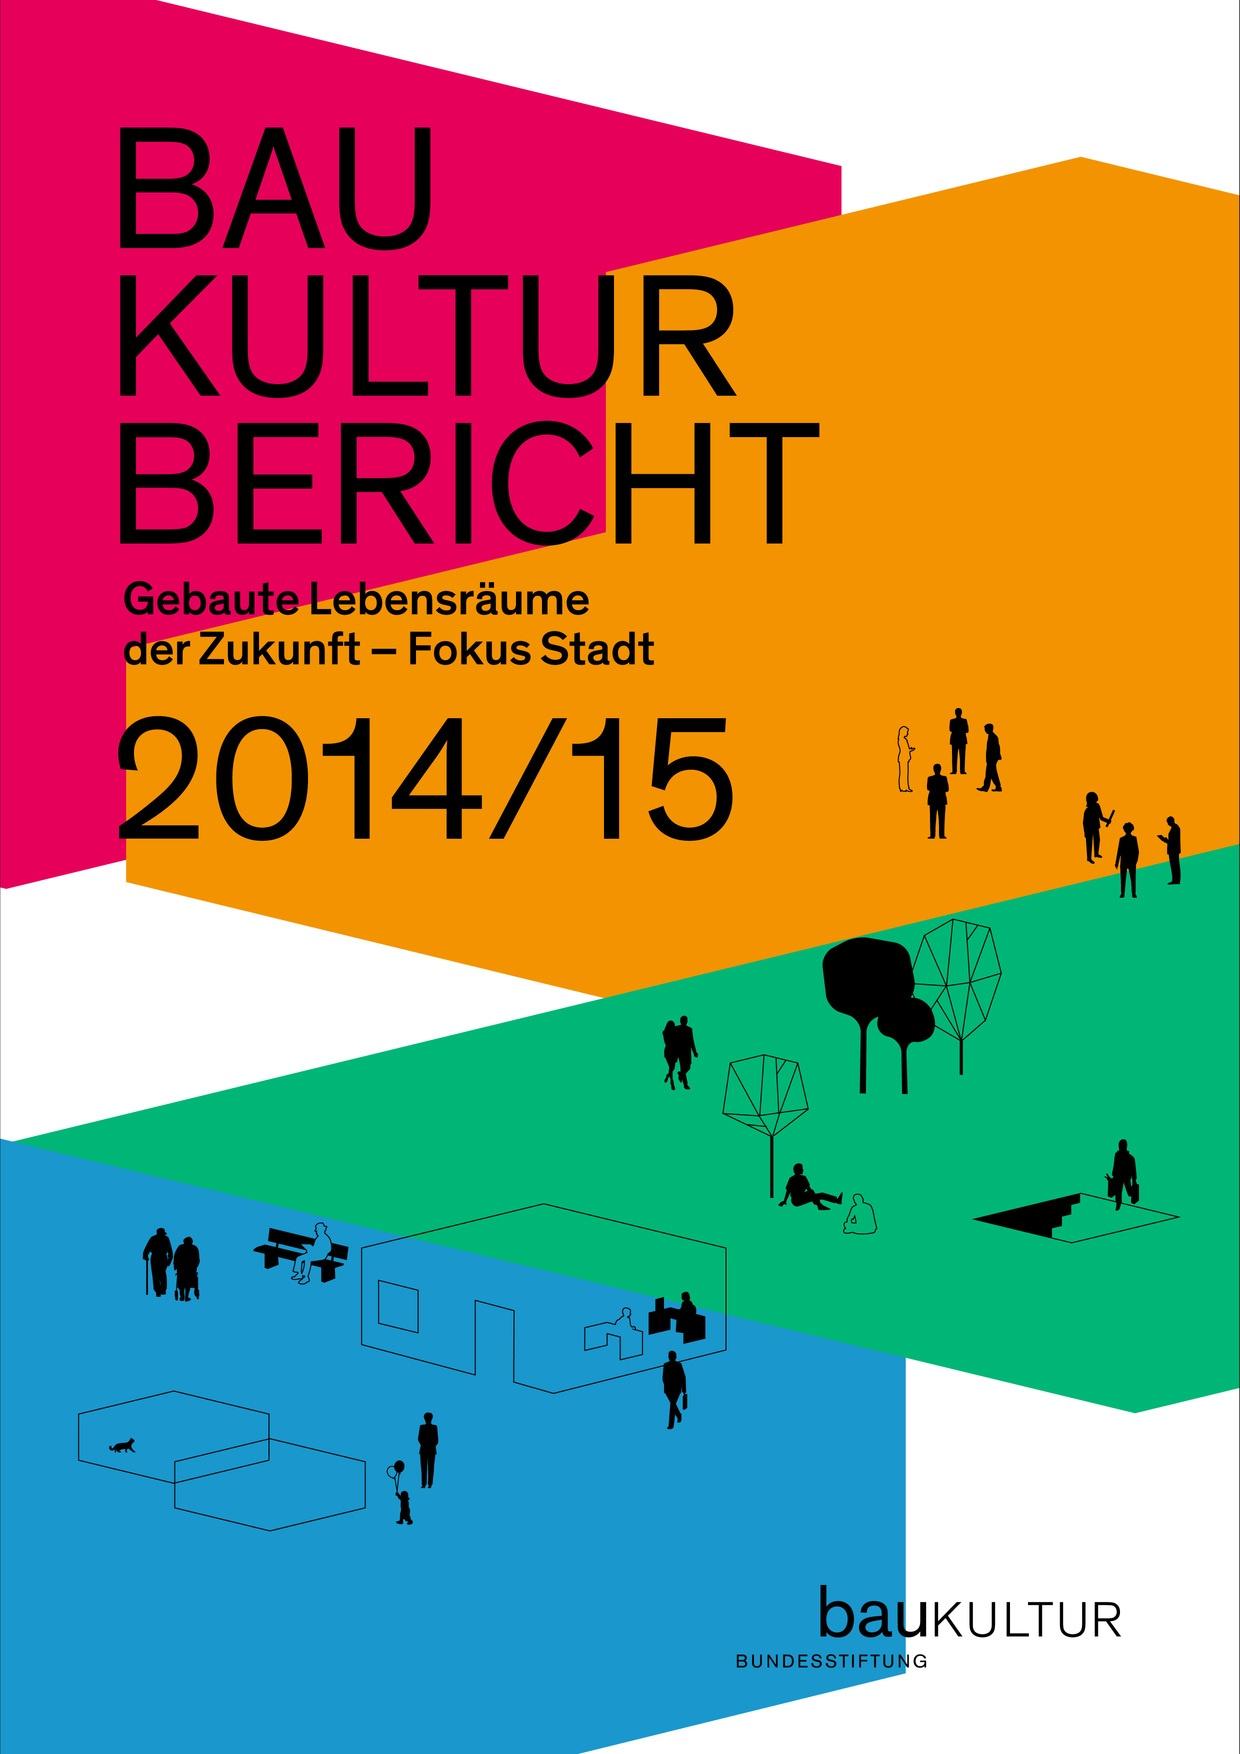 Baukulturbericht 2014_2015 - Bundesstiftung Baukultur